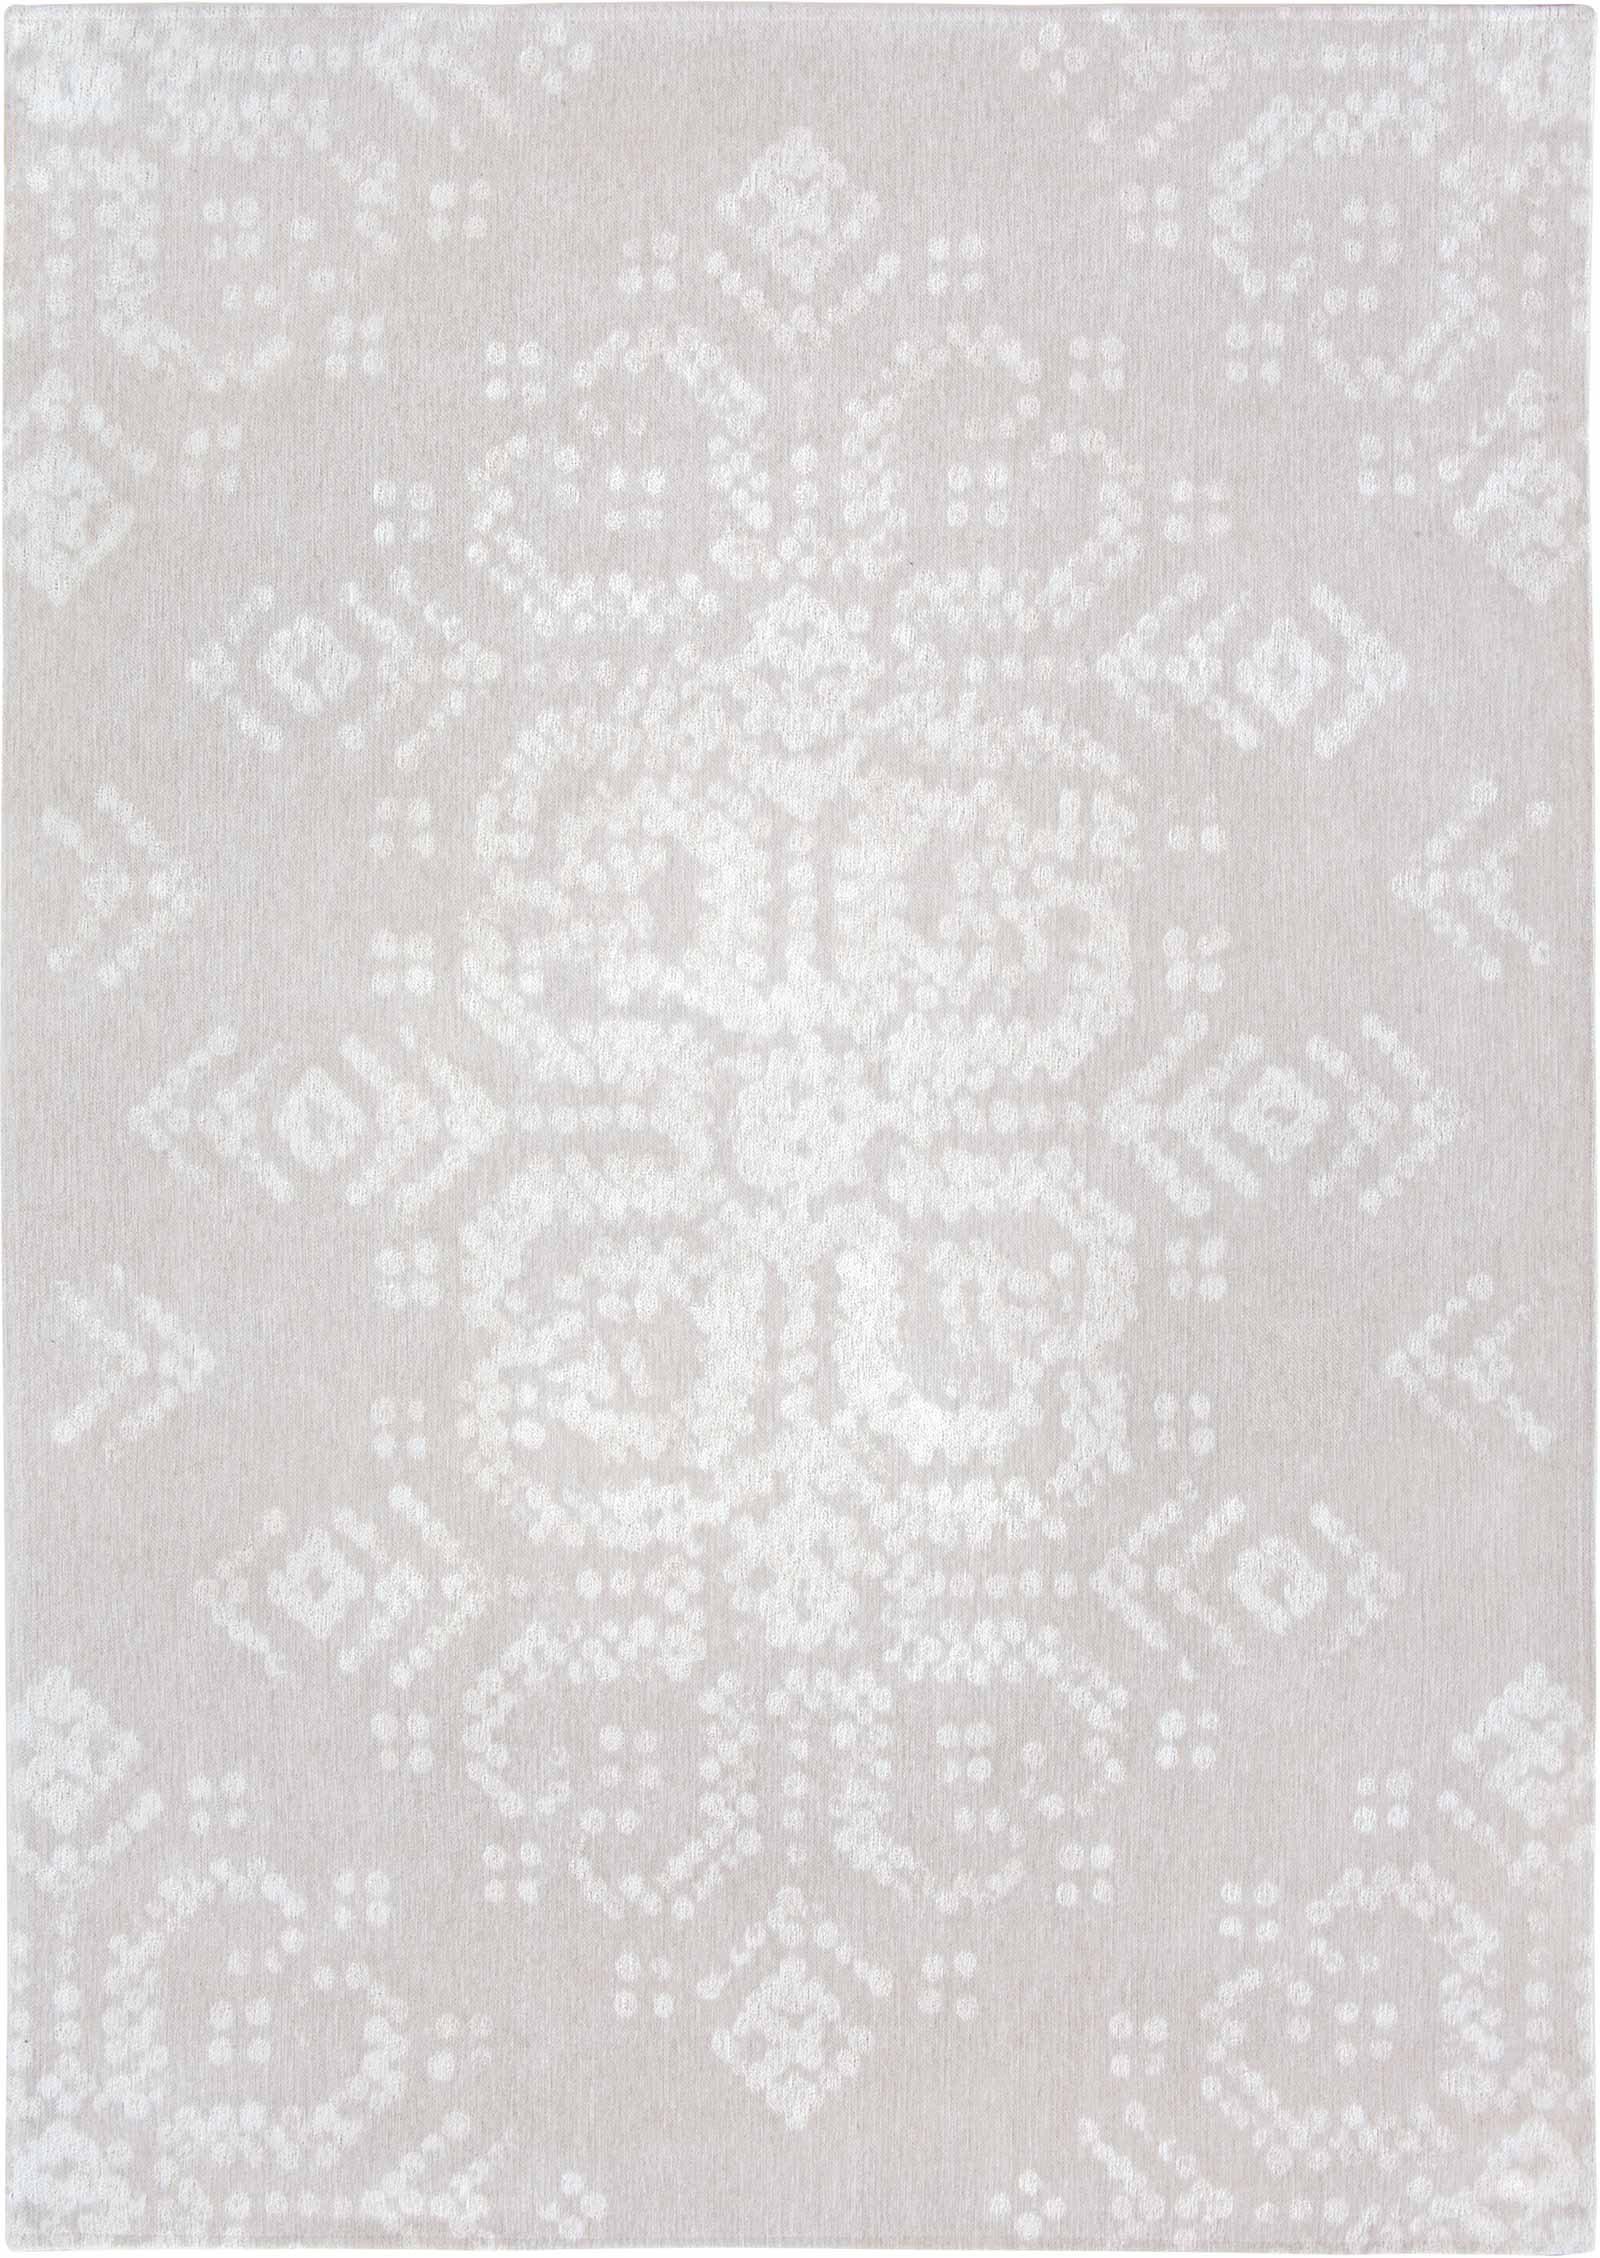 Louis De Poortere rugs Villa Nova LX 8759 Marit Rice